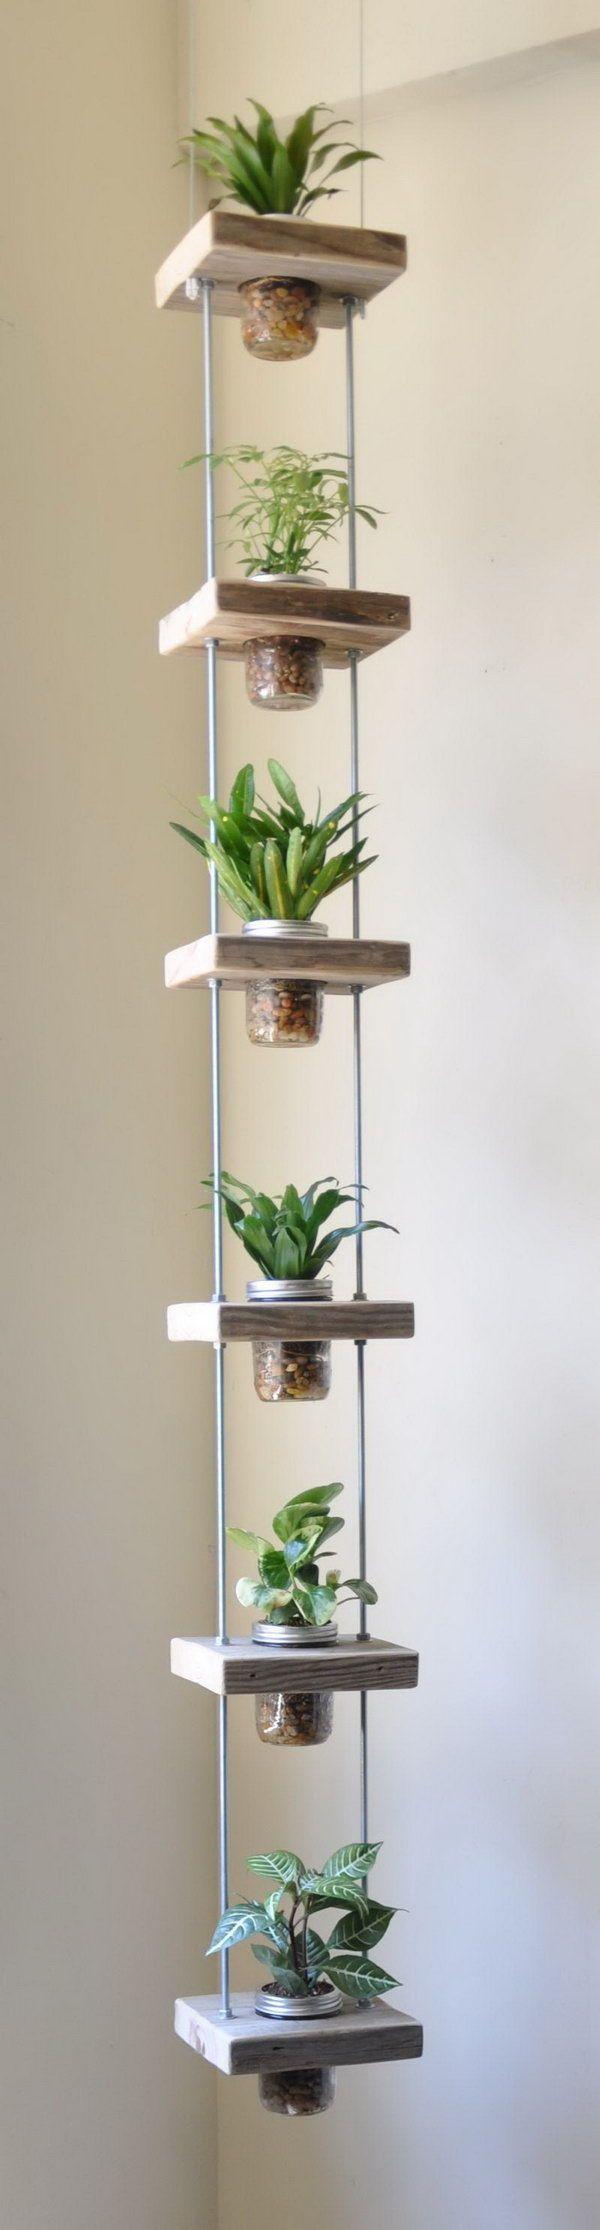 vertical herb garden from salvaged wood and mason jars, Cool DIY Indoor Herb Garden Ideas, http://hative.com/cool-diy-indoor-herb-garden-ideas/,